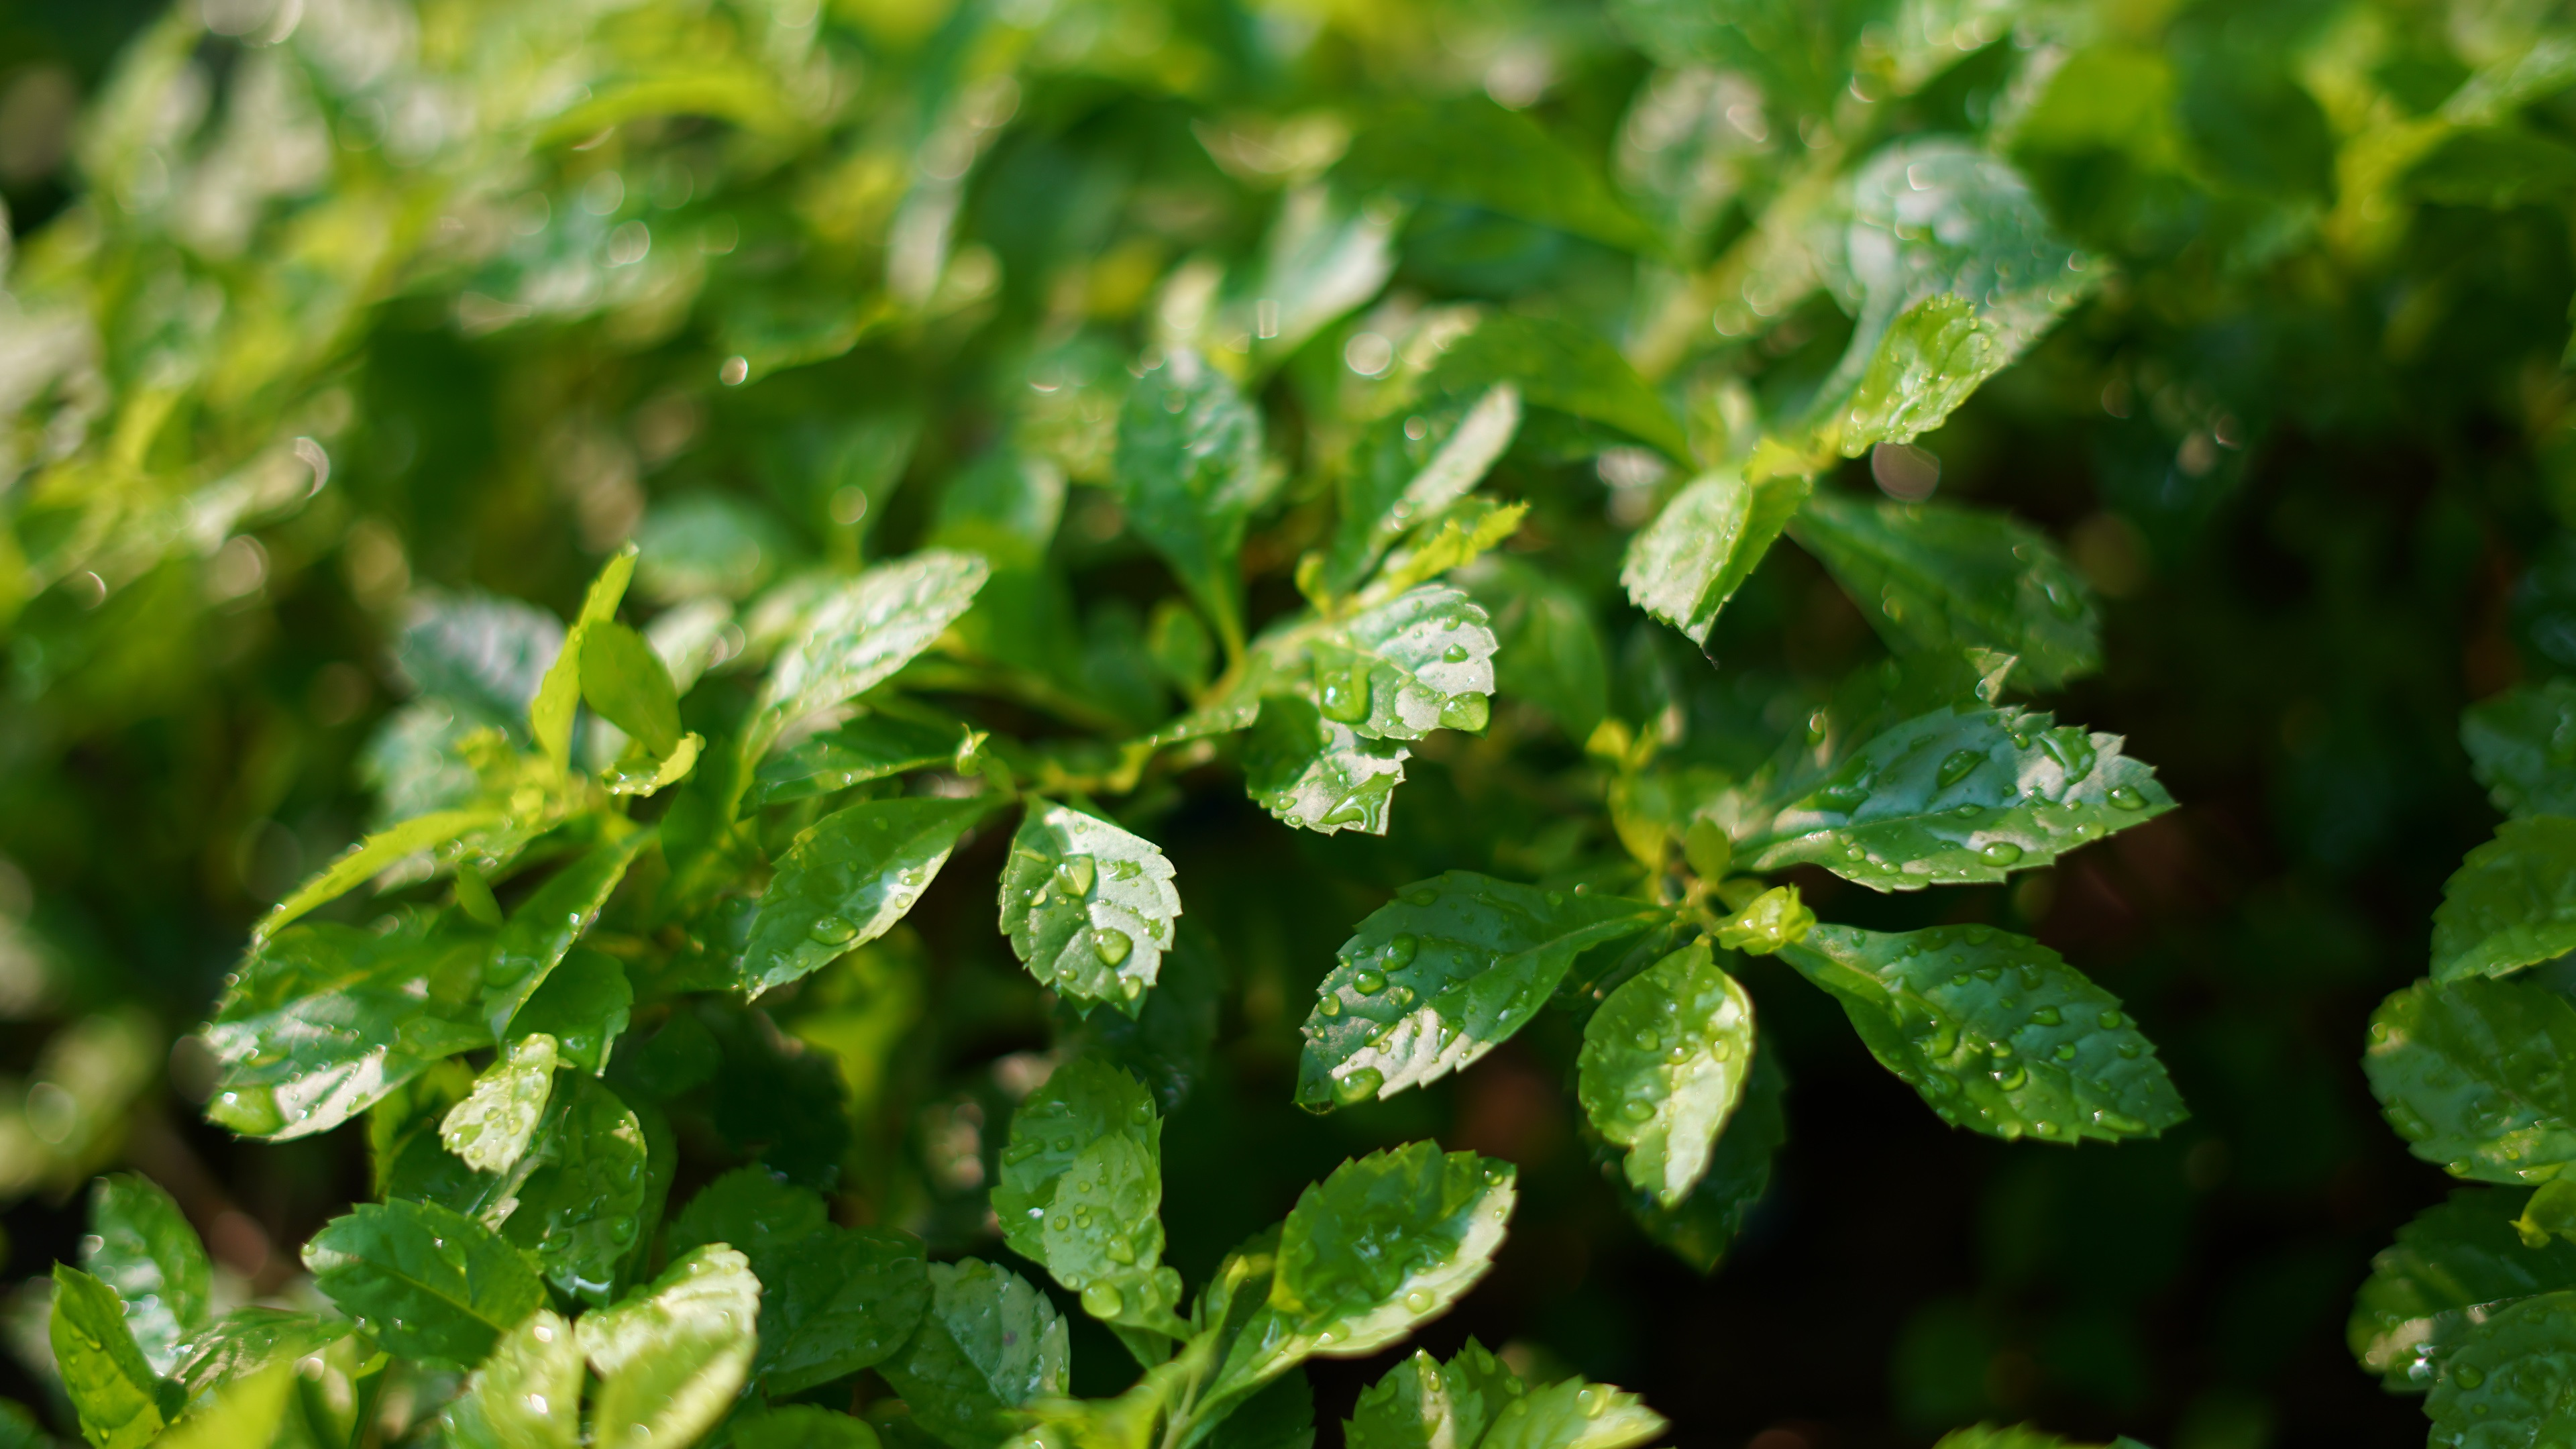 Wallpaper Plants Green Leaves After Rain Water Drops 3840x2160 UHD